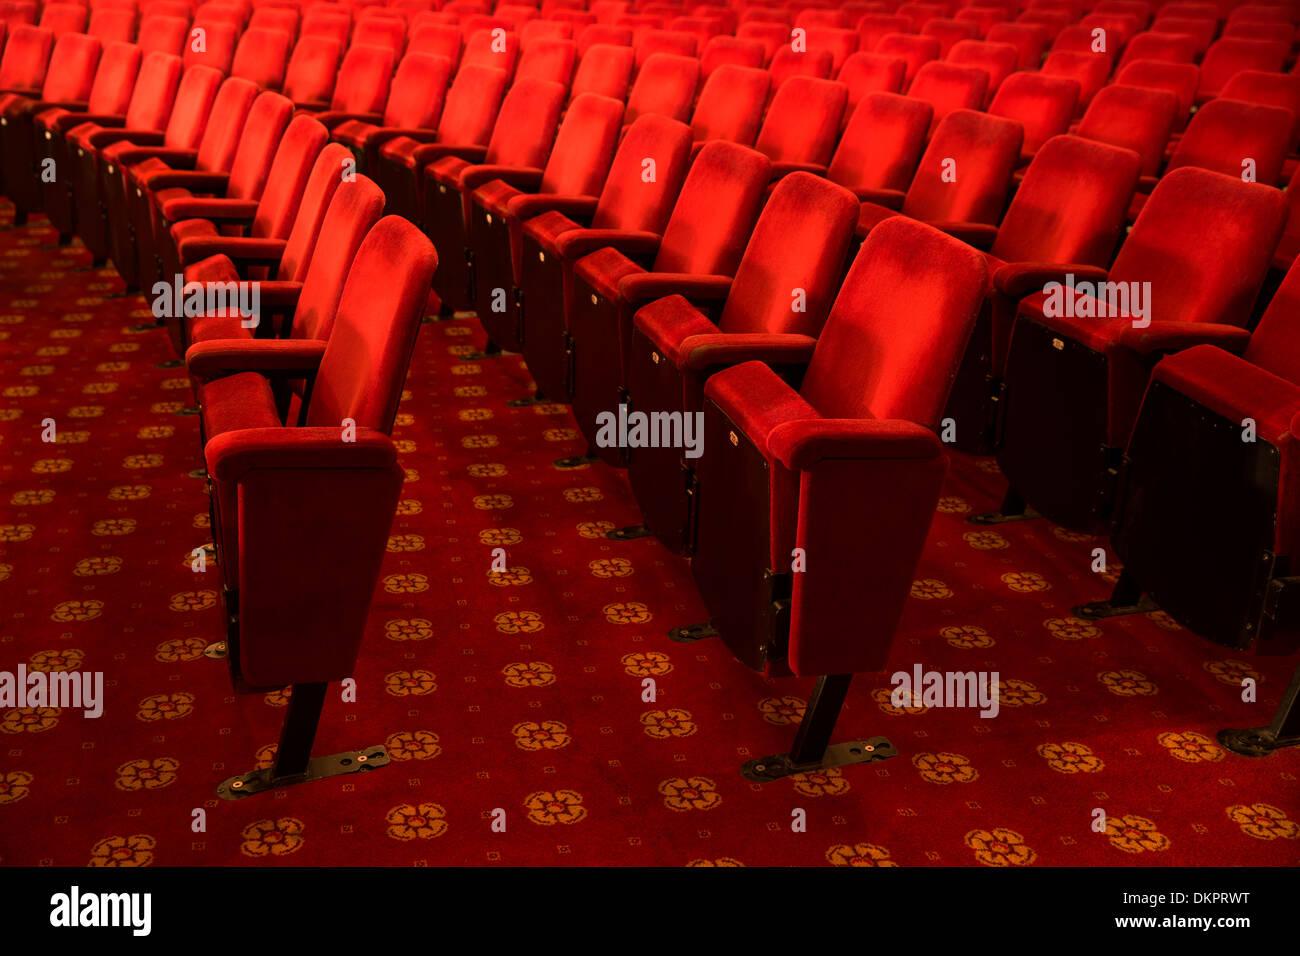 Seats in empty theater auditorium - Stock Image